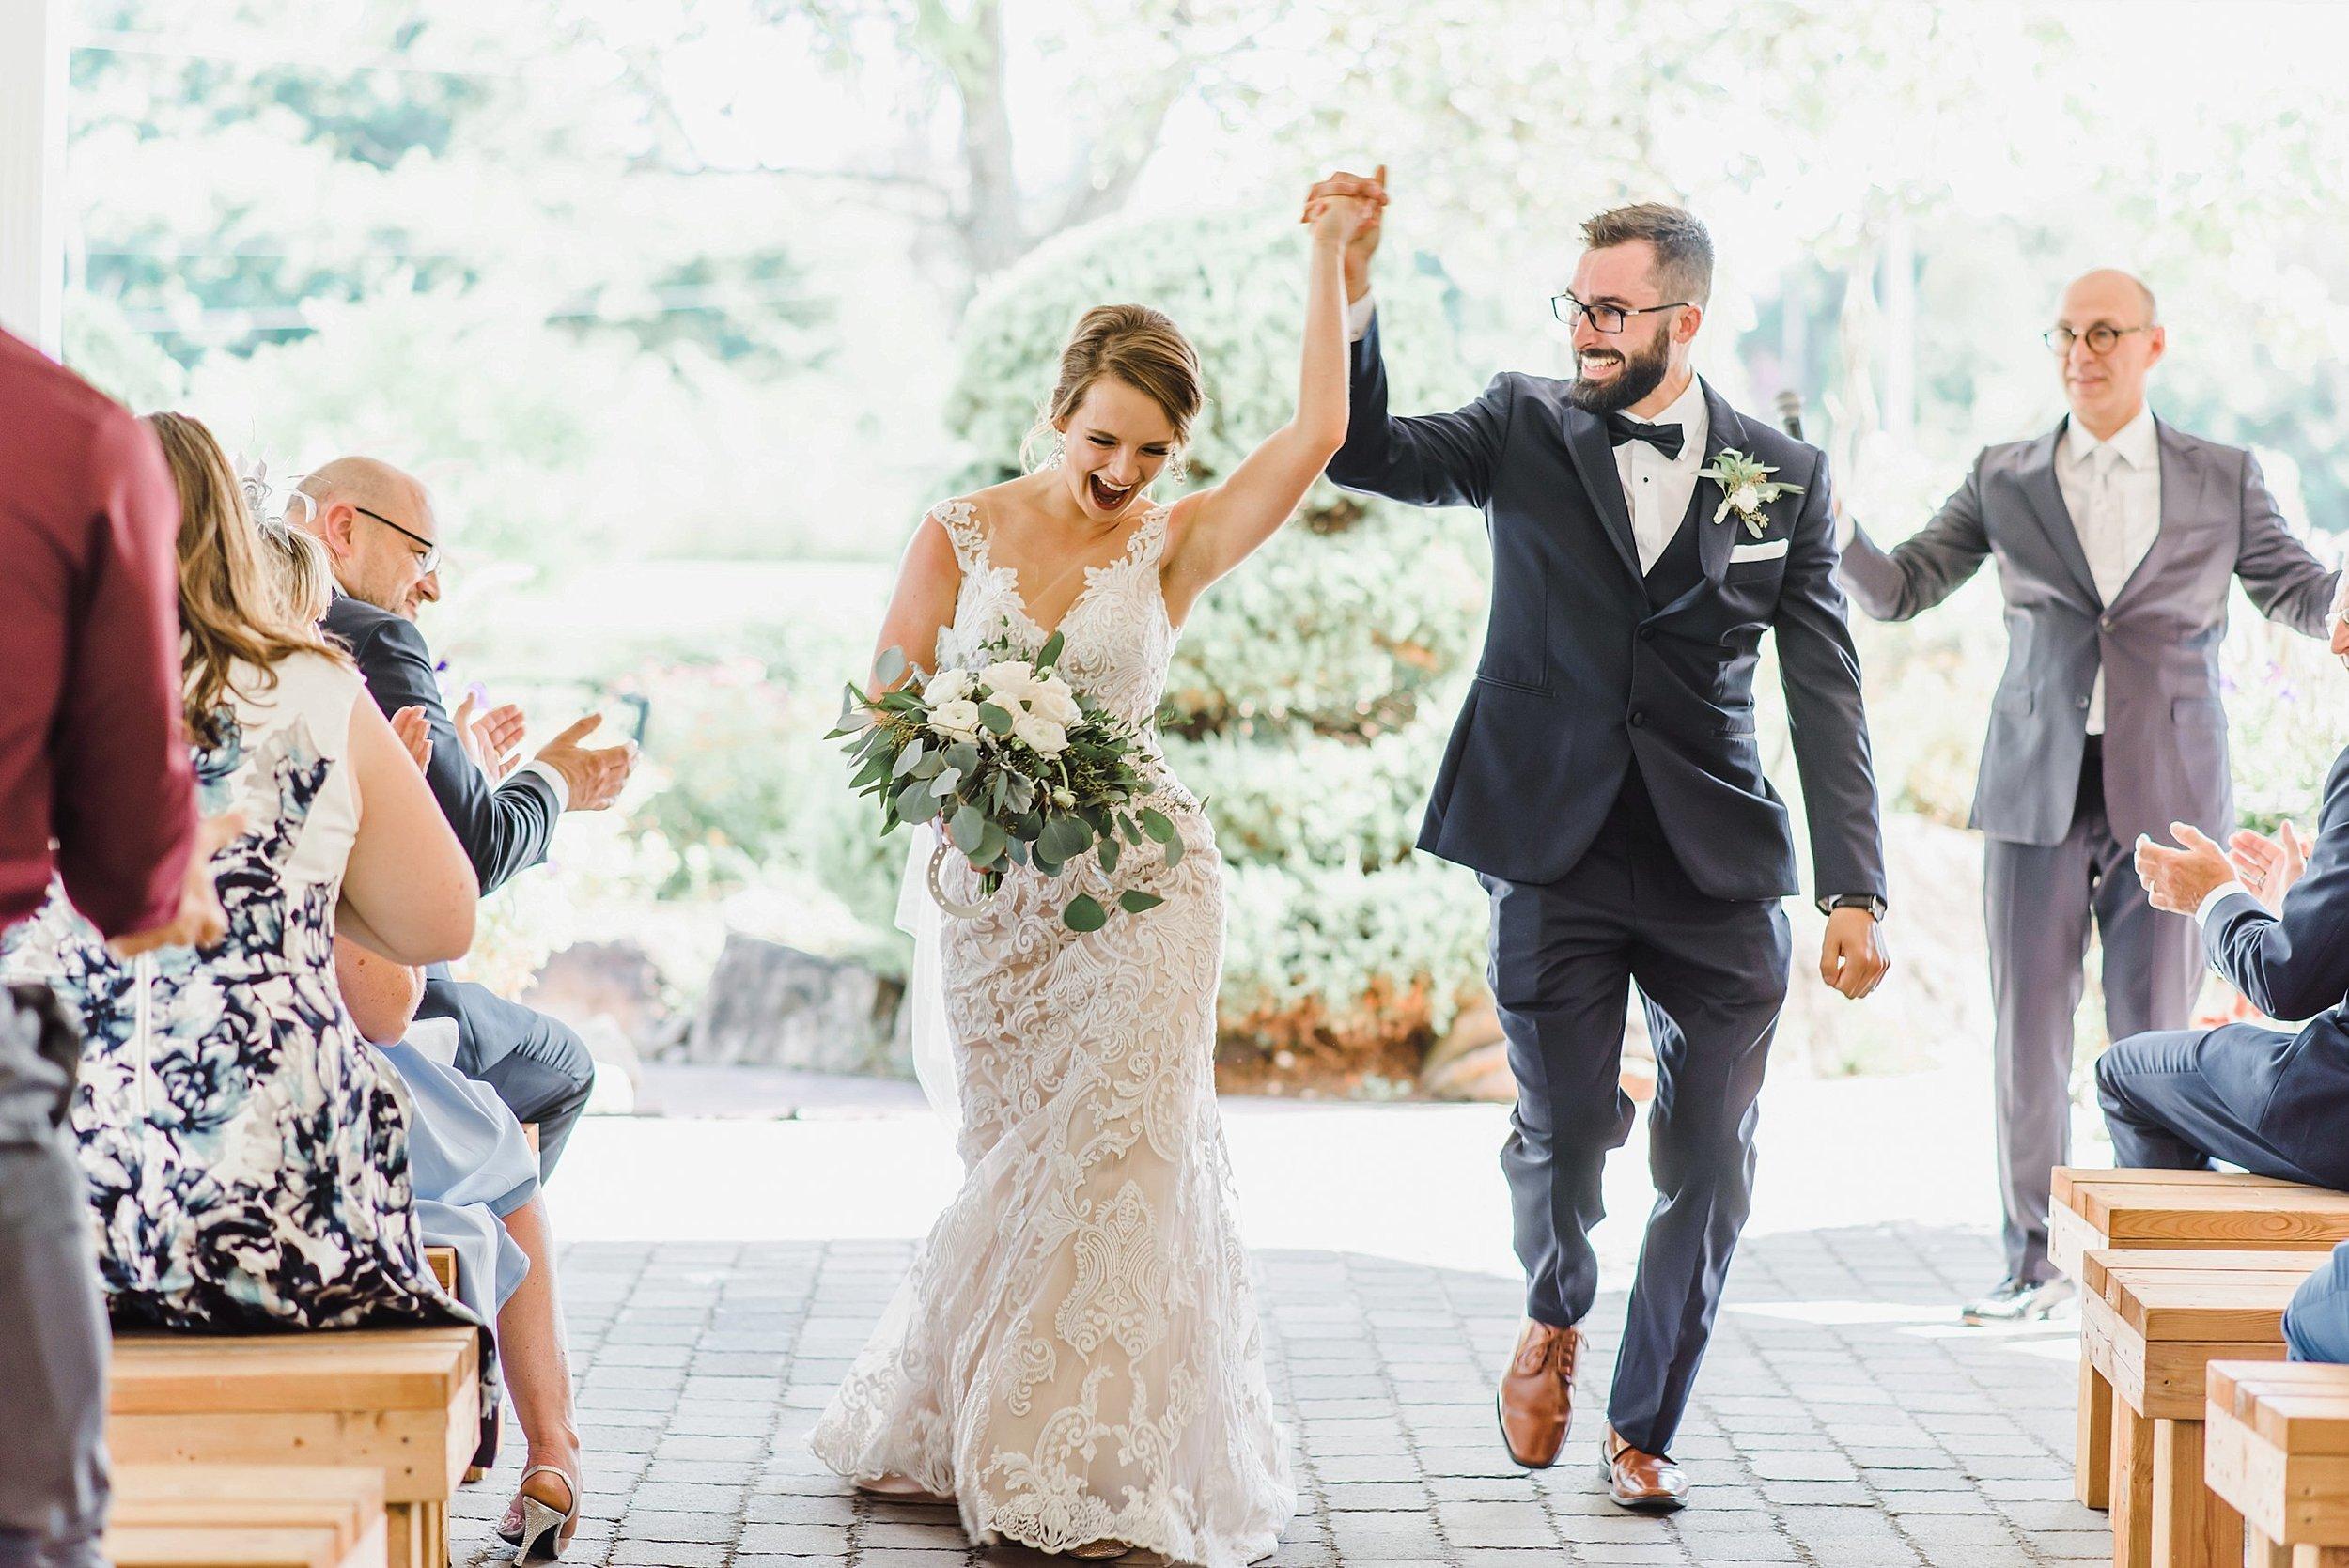 light airy indie fine art ottawa wedding photographer | Ali and Batoul Photography_1280.jpg